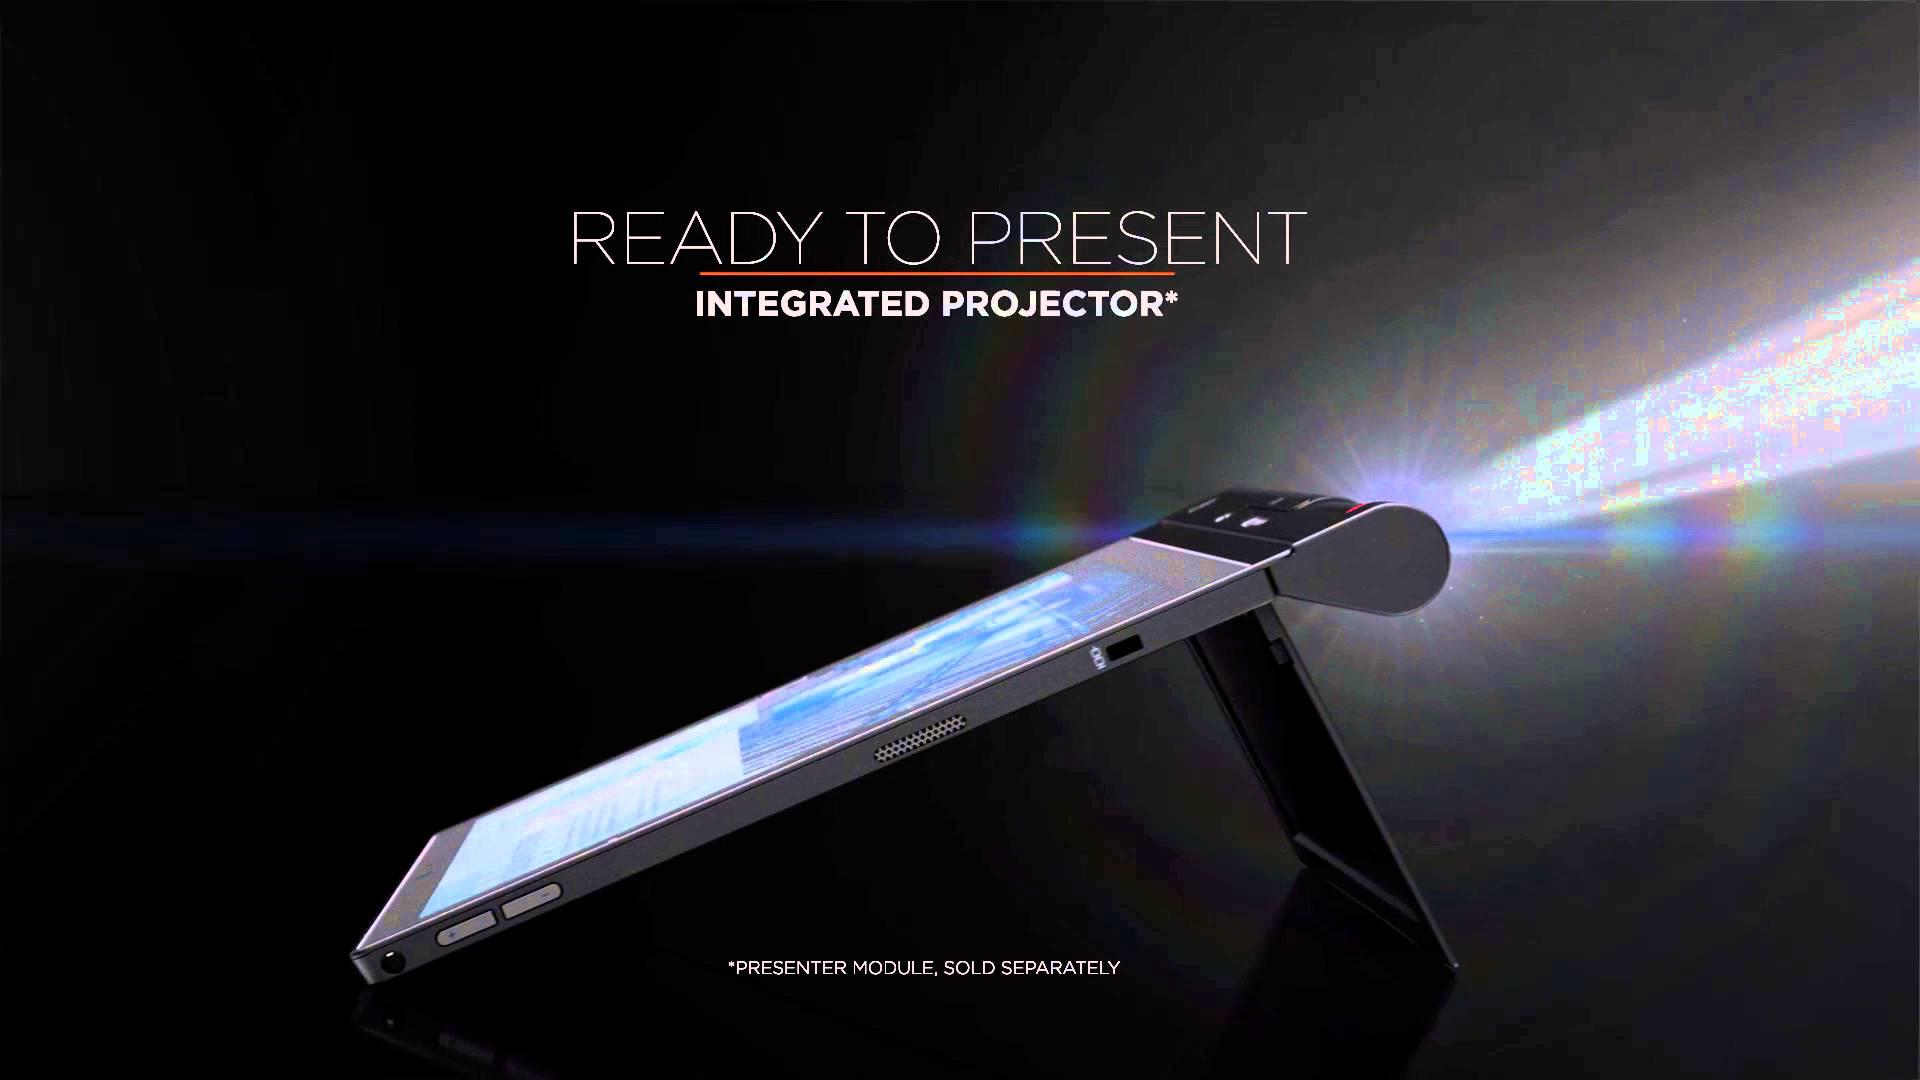 Lenovo ThinkPad X1 Tablet (1st Gen) 20GG | Product Details